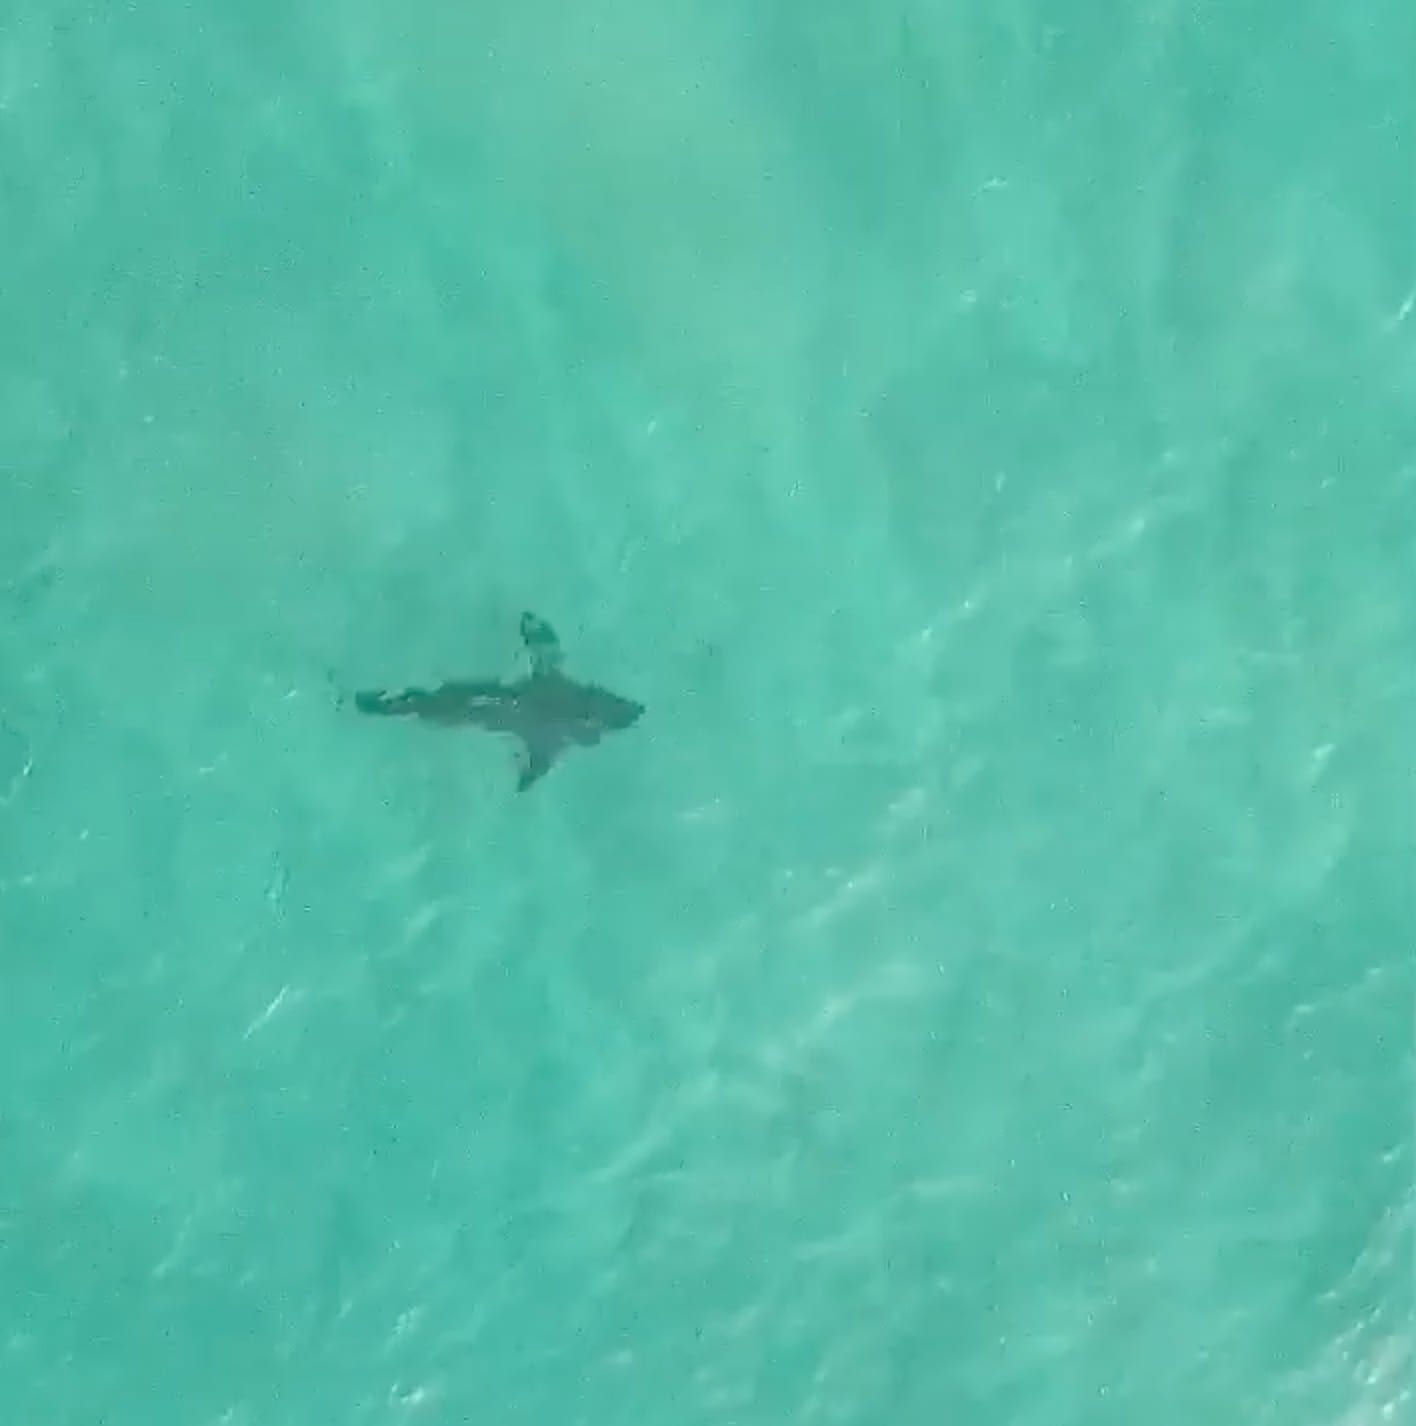 Drone spots great White Shark off Bondi Beach in Sydney, Australia